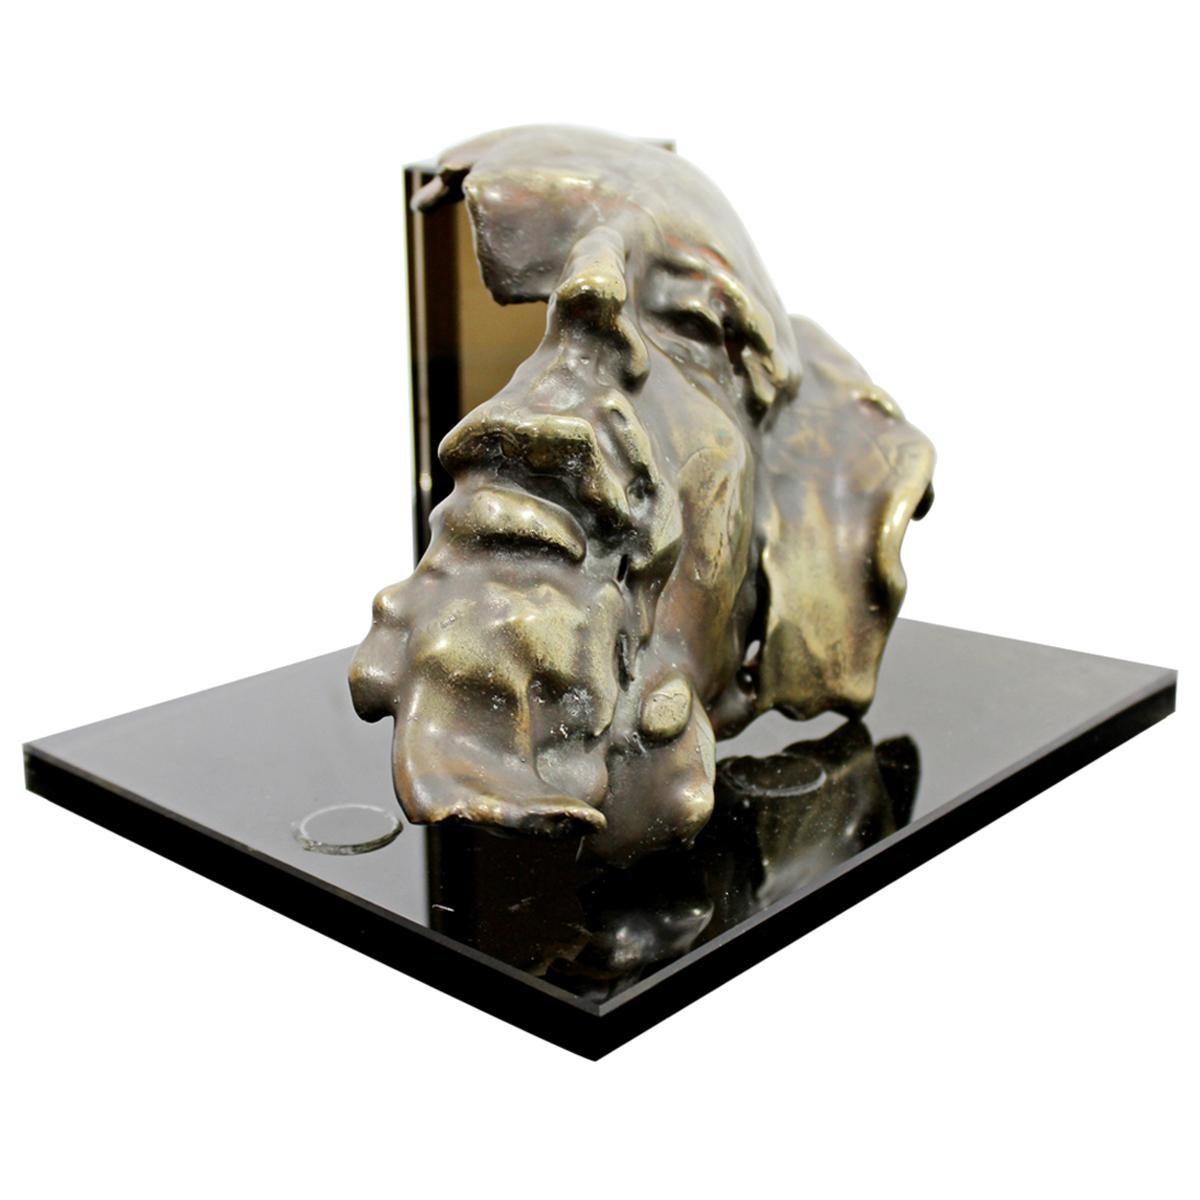 Contemporary Modern Bronze Face Table Sculpture Signed Gordon Hipp Dated 1990s